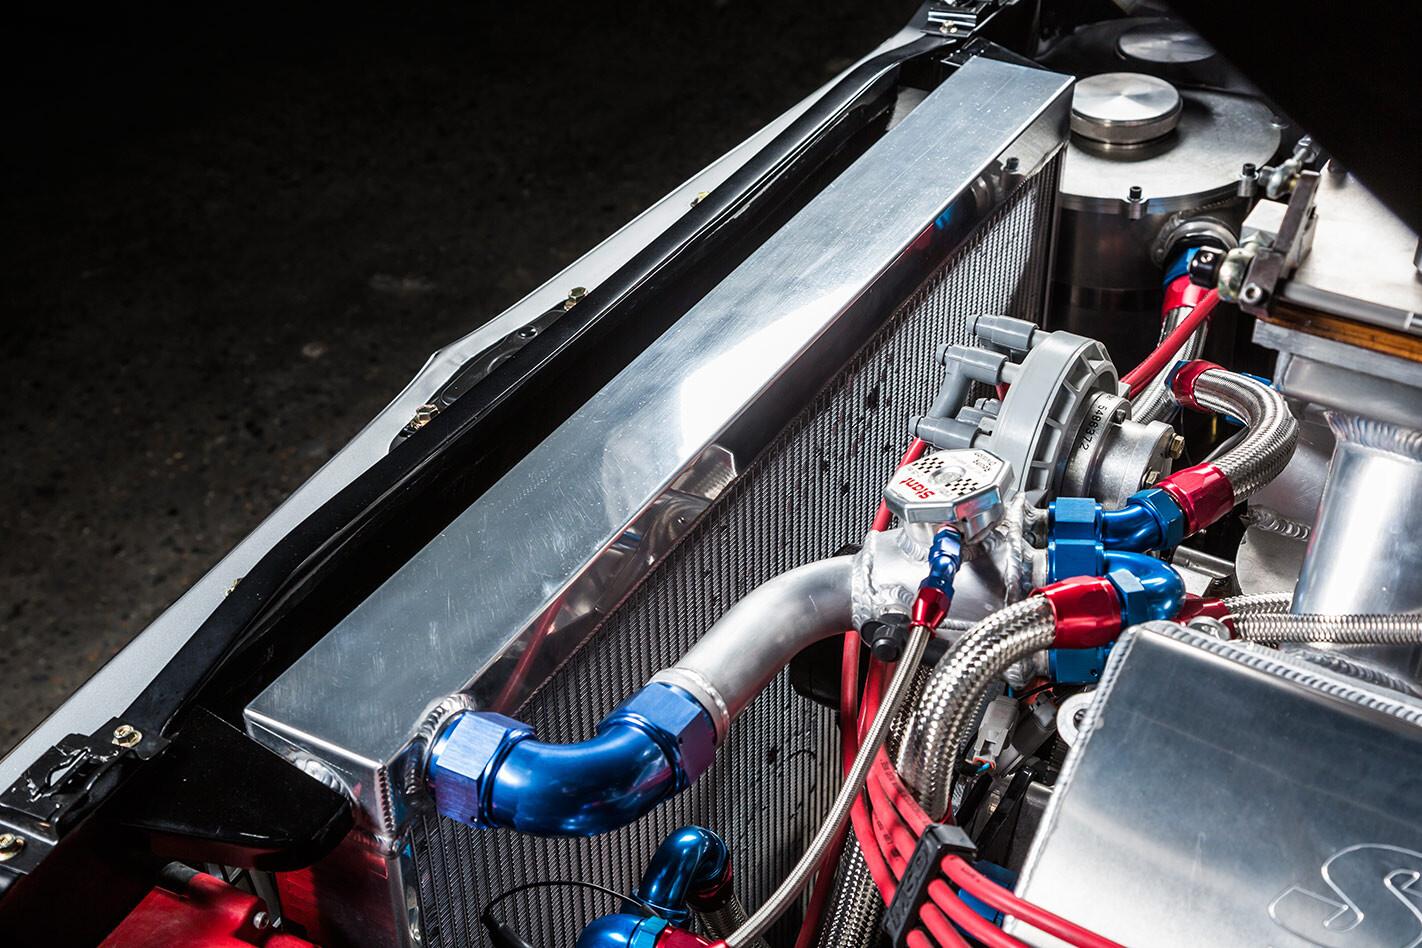 Ford Falcon XY radiator